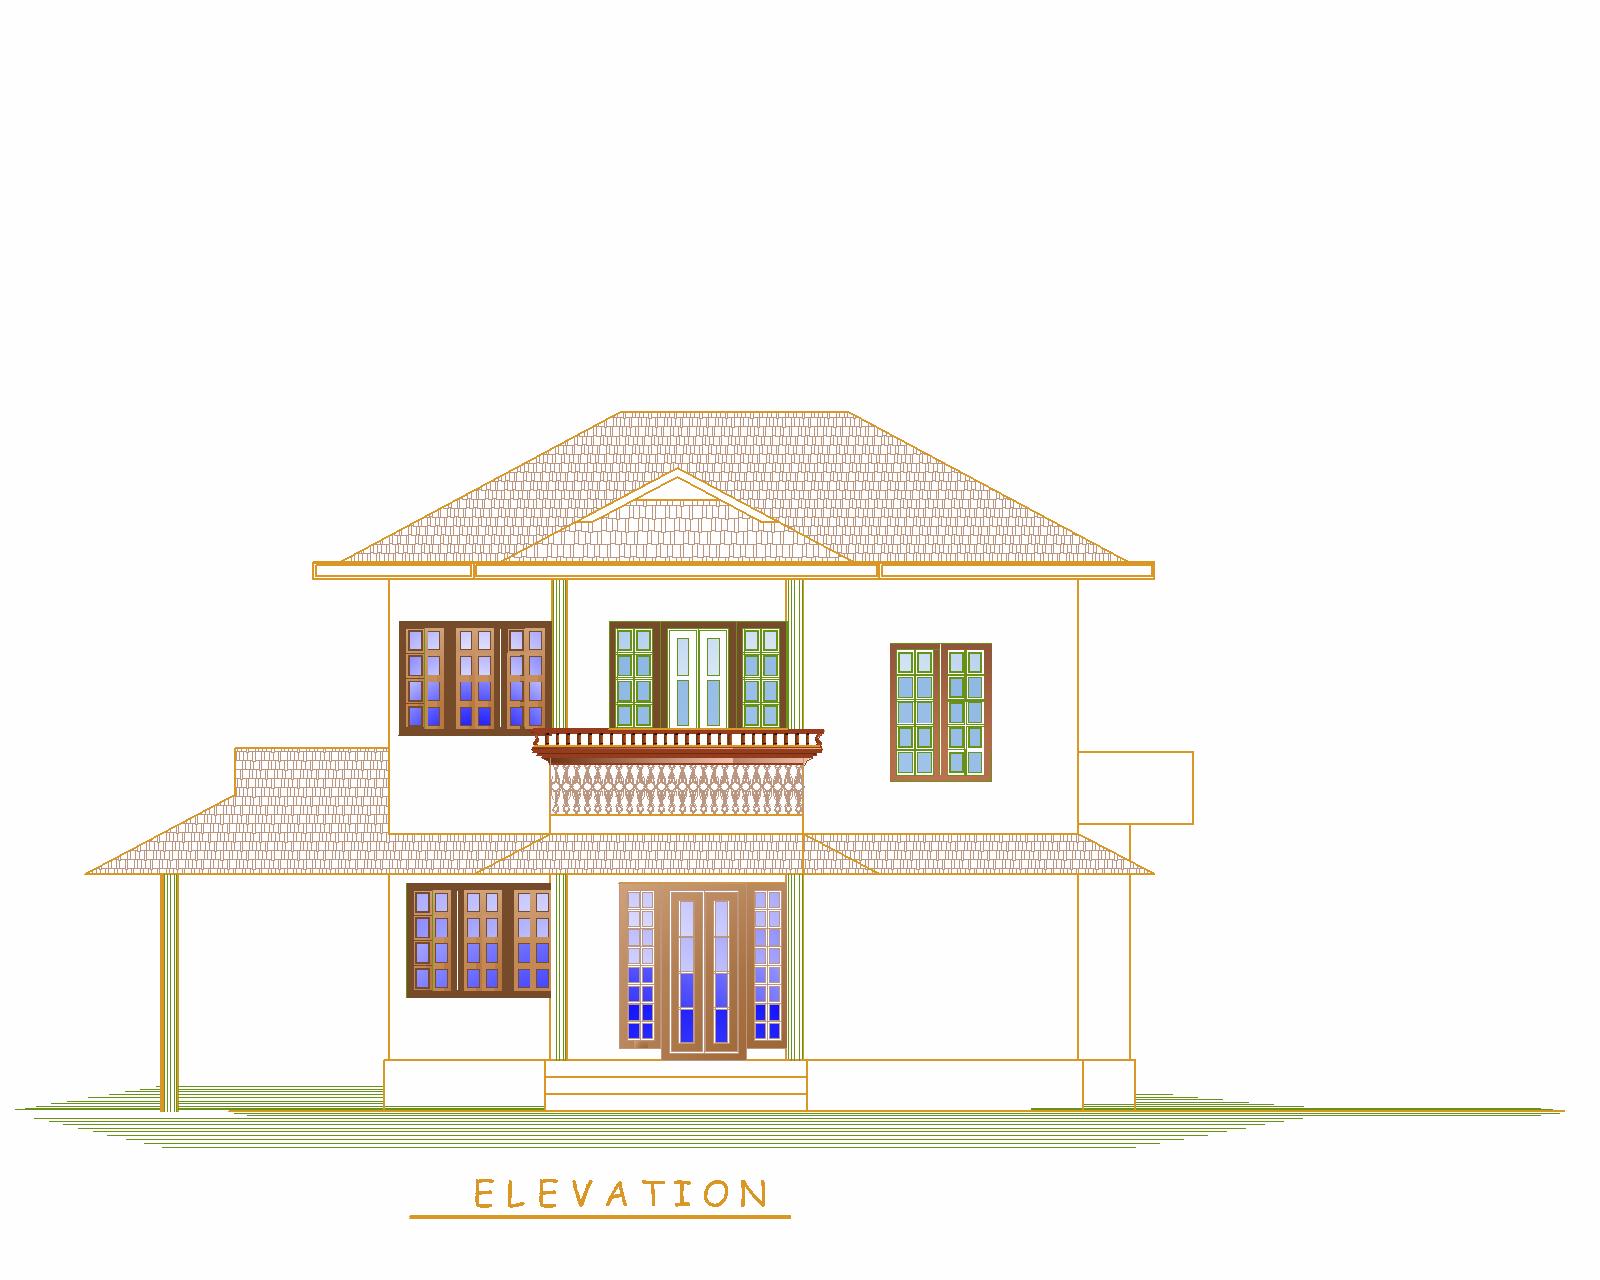 Buat testing doang three bedroom house in kerala for 2 bedroom house plan kerala